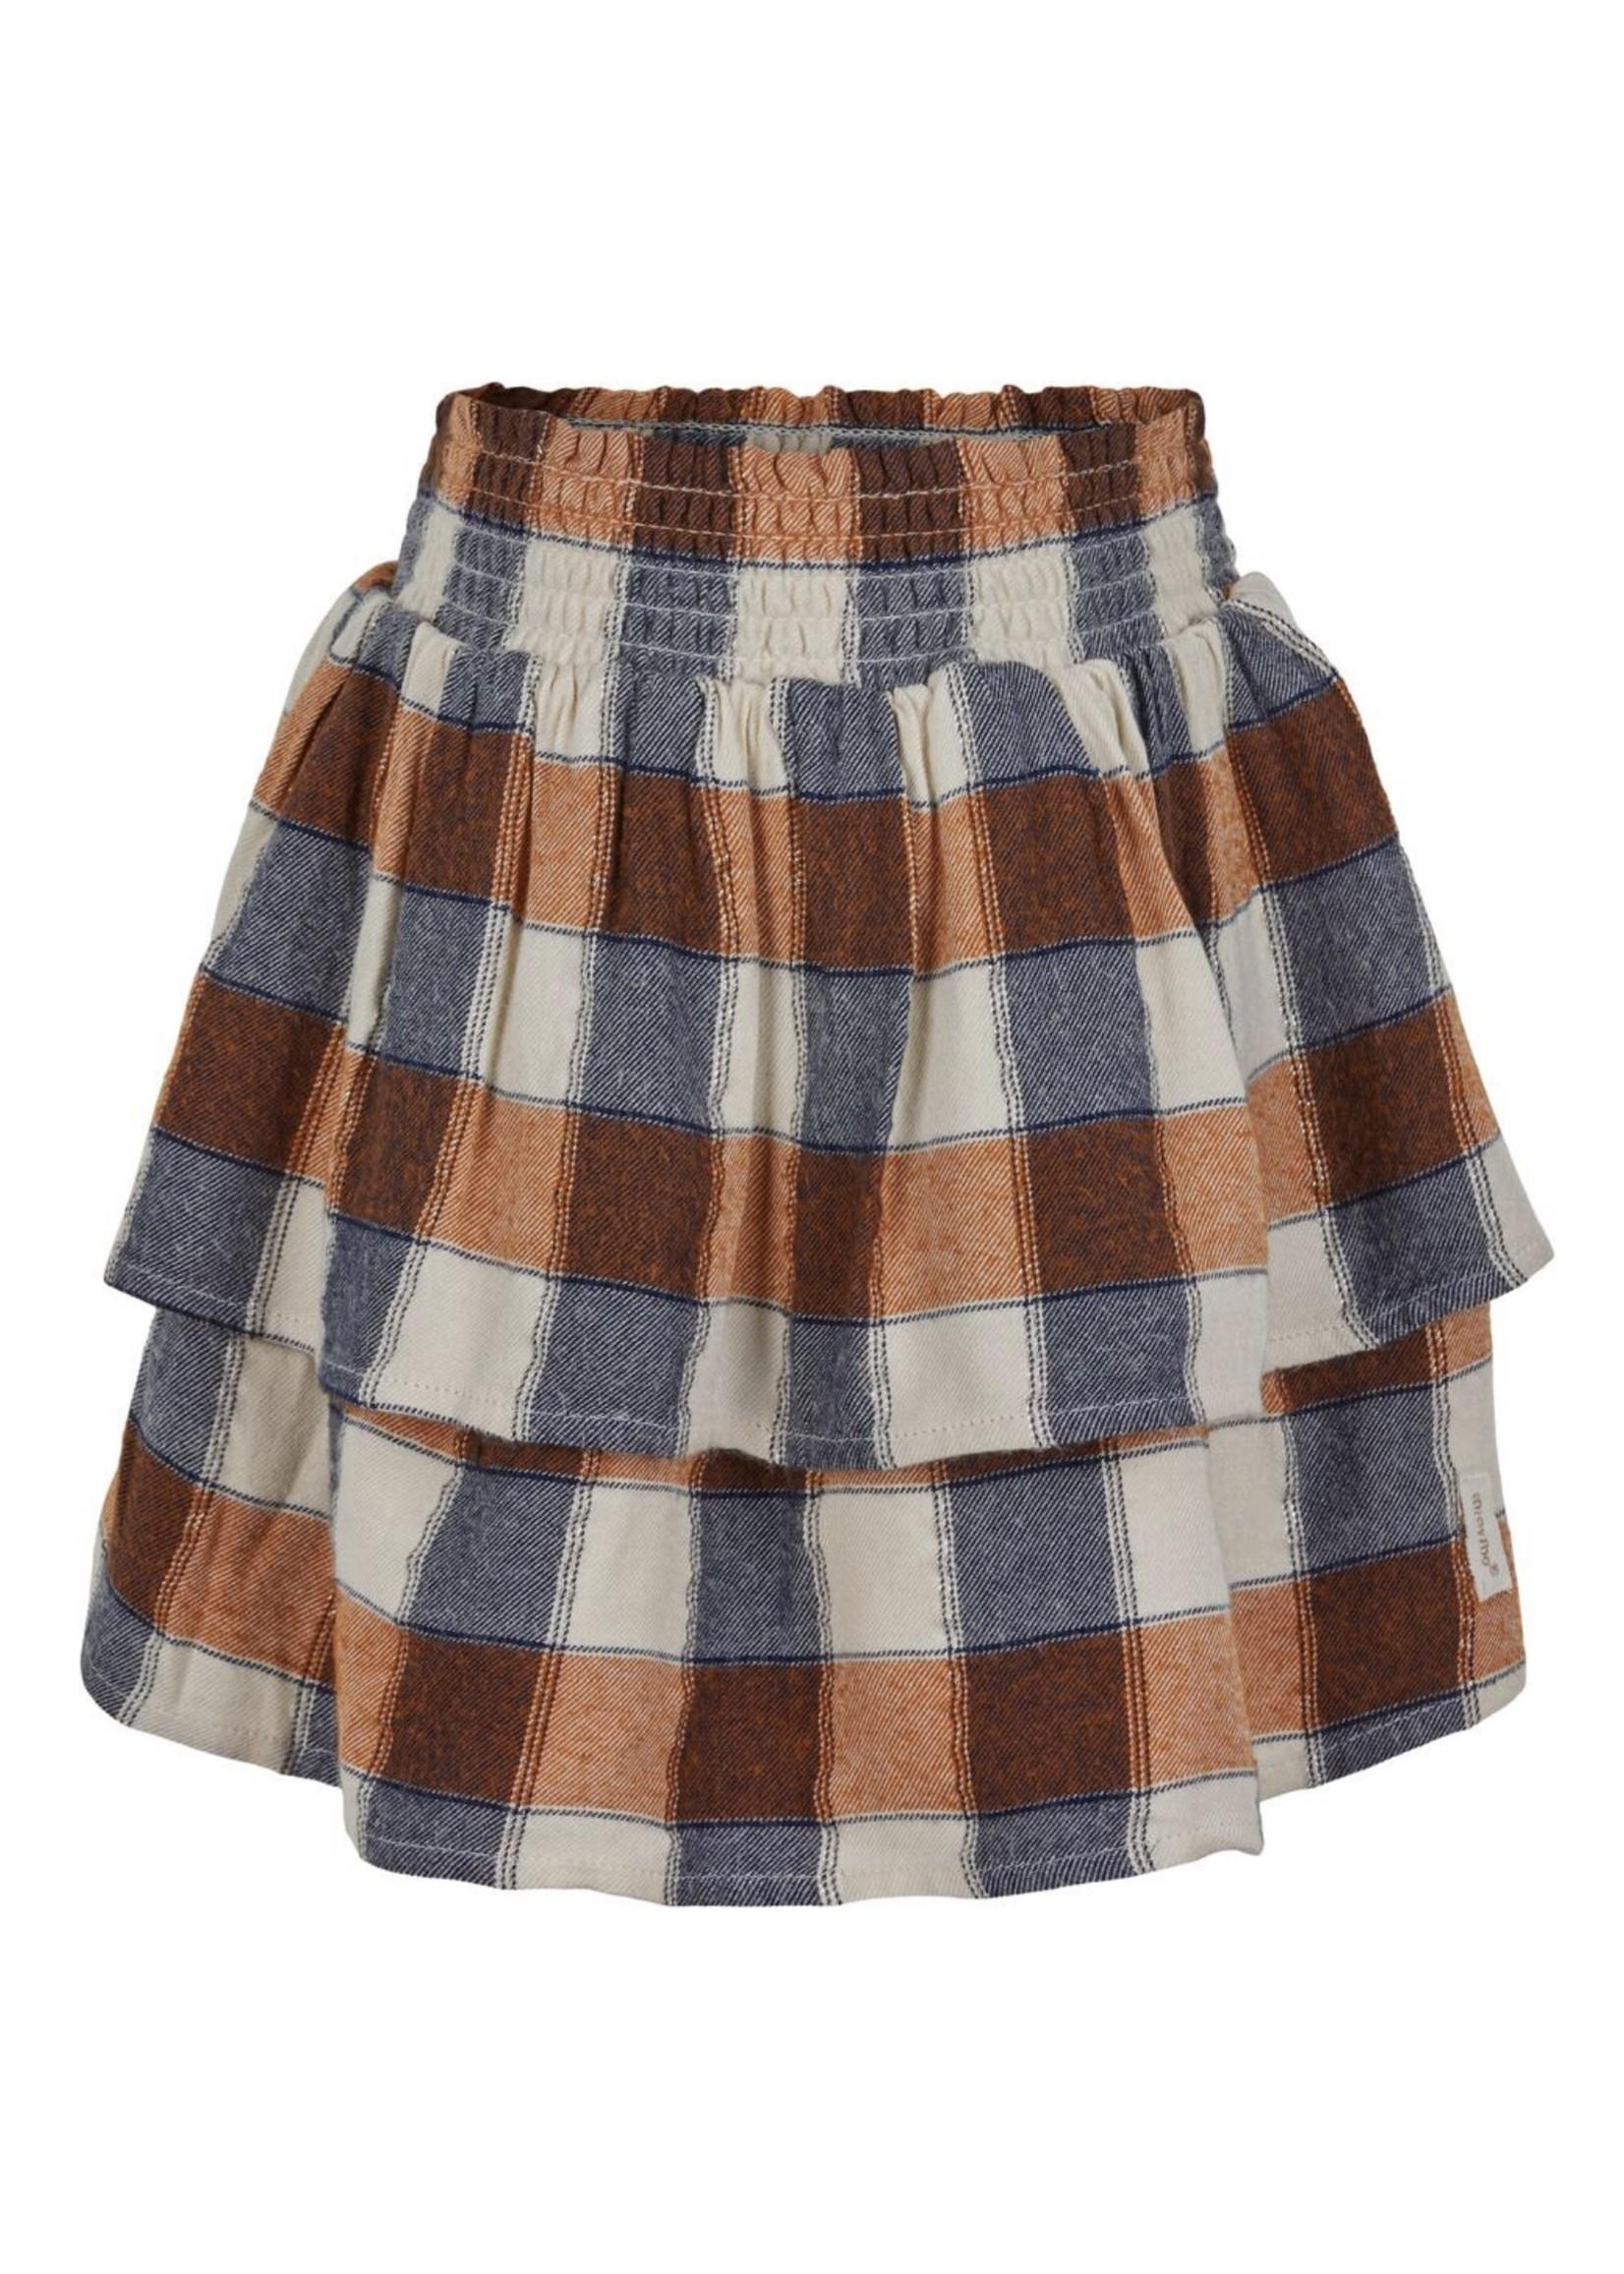 MM Fall Plaid Skirt w/Scrunchie